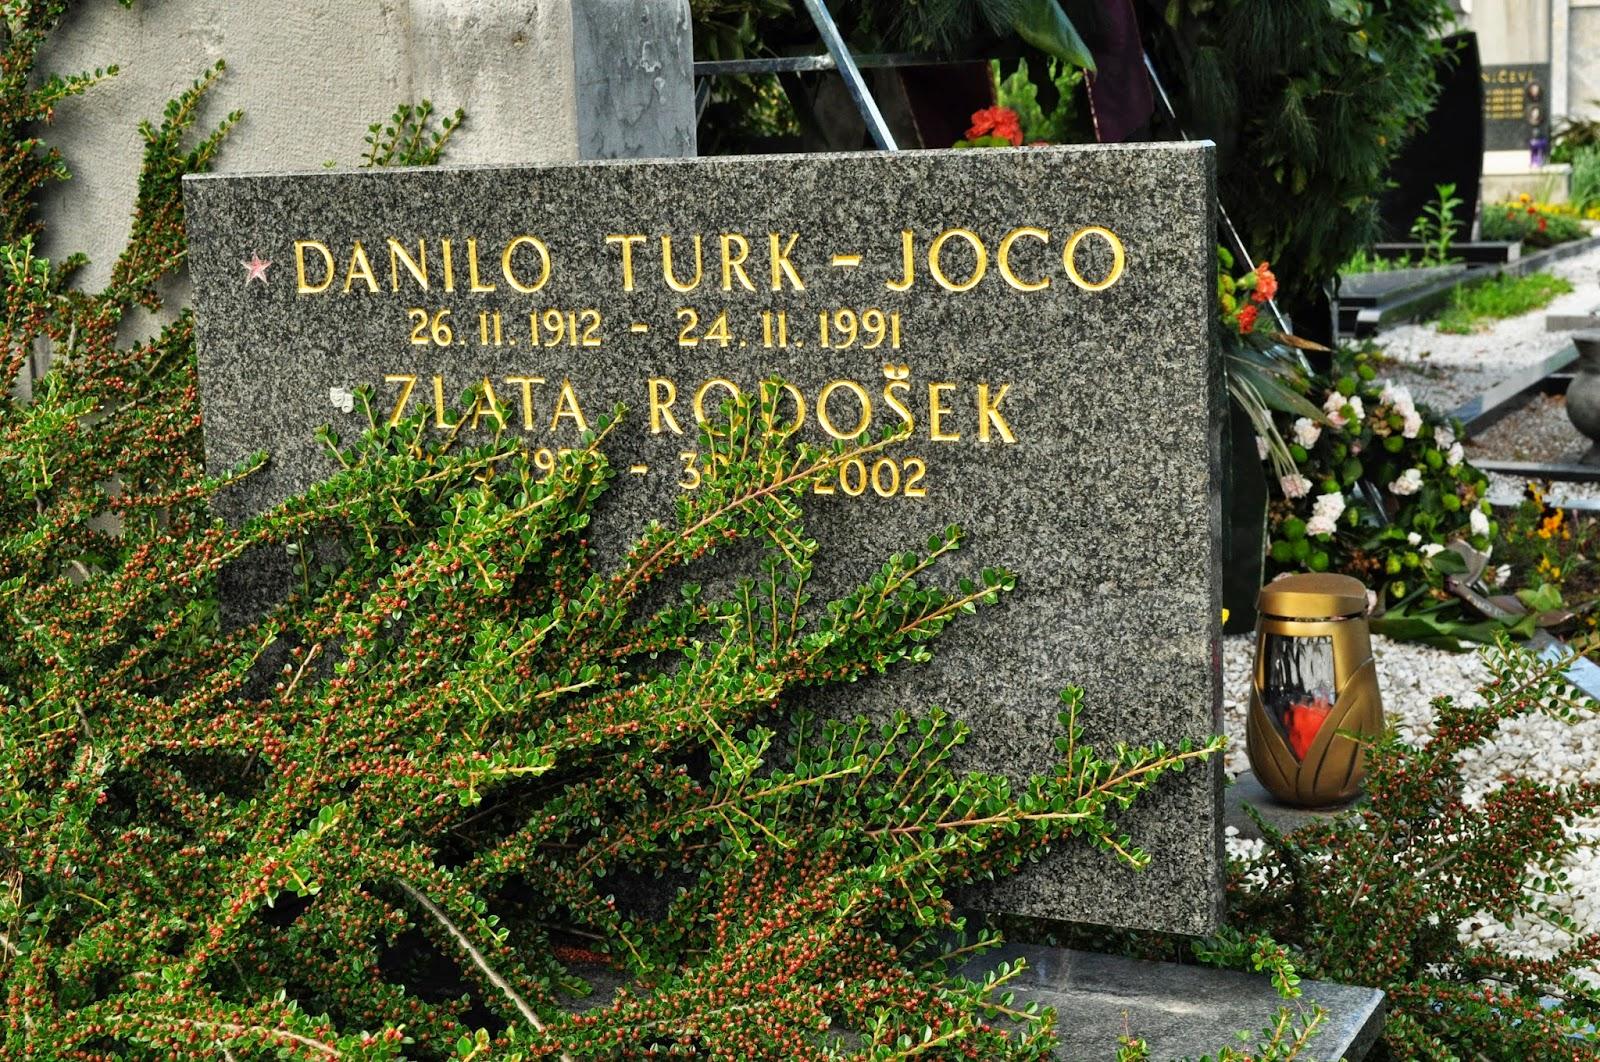 Zlata Rodošek in Danilo Turk-Joco